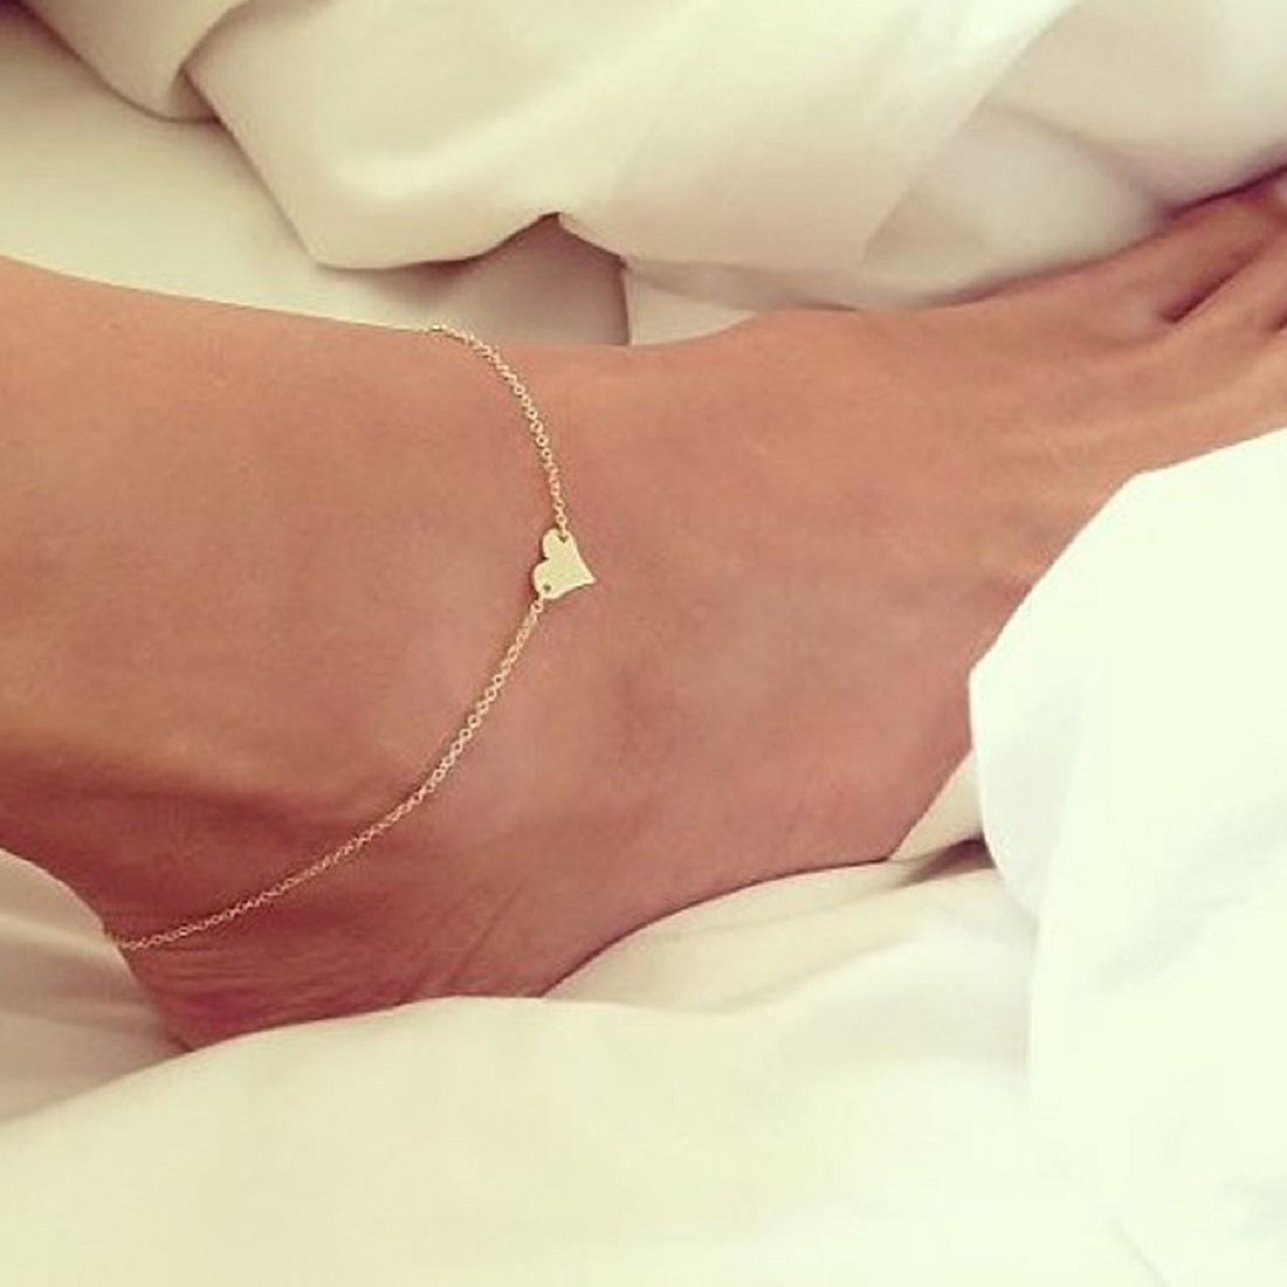 Sandistore Girl Simple Heart Ankle Bracelet Chain Beach Foot Sandal Jewelry